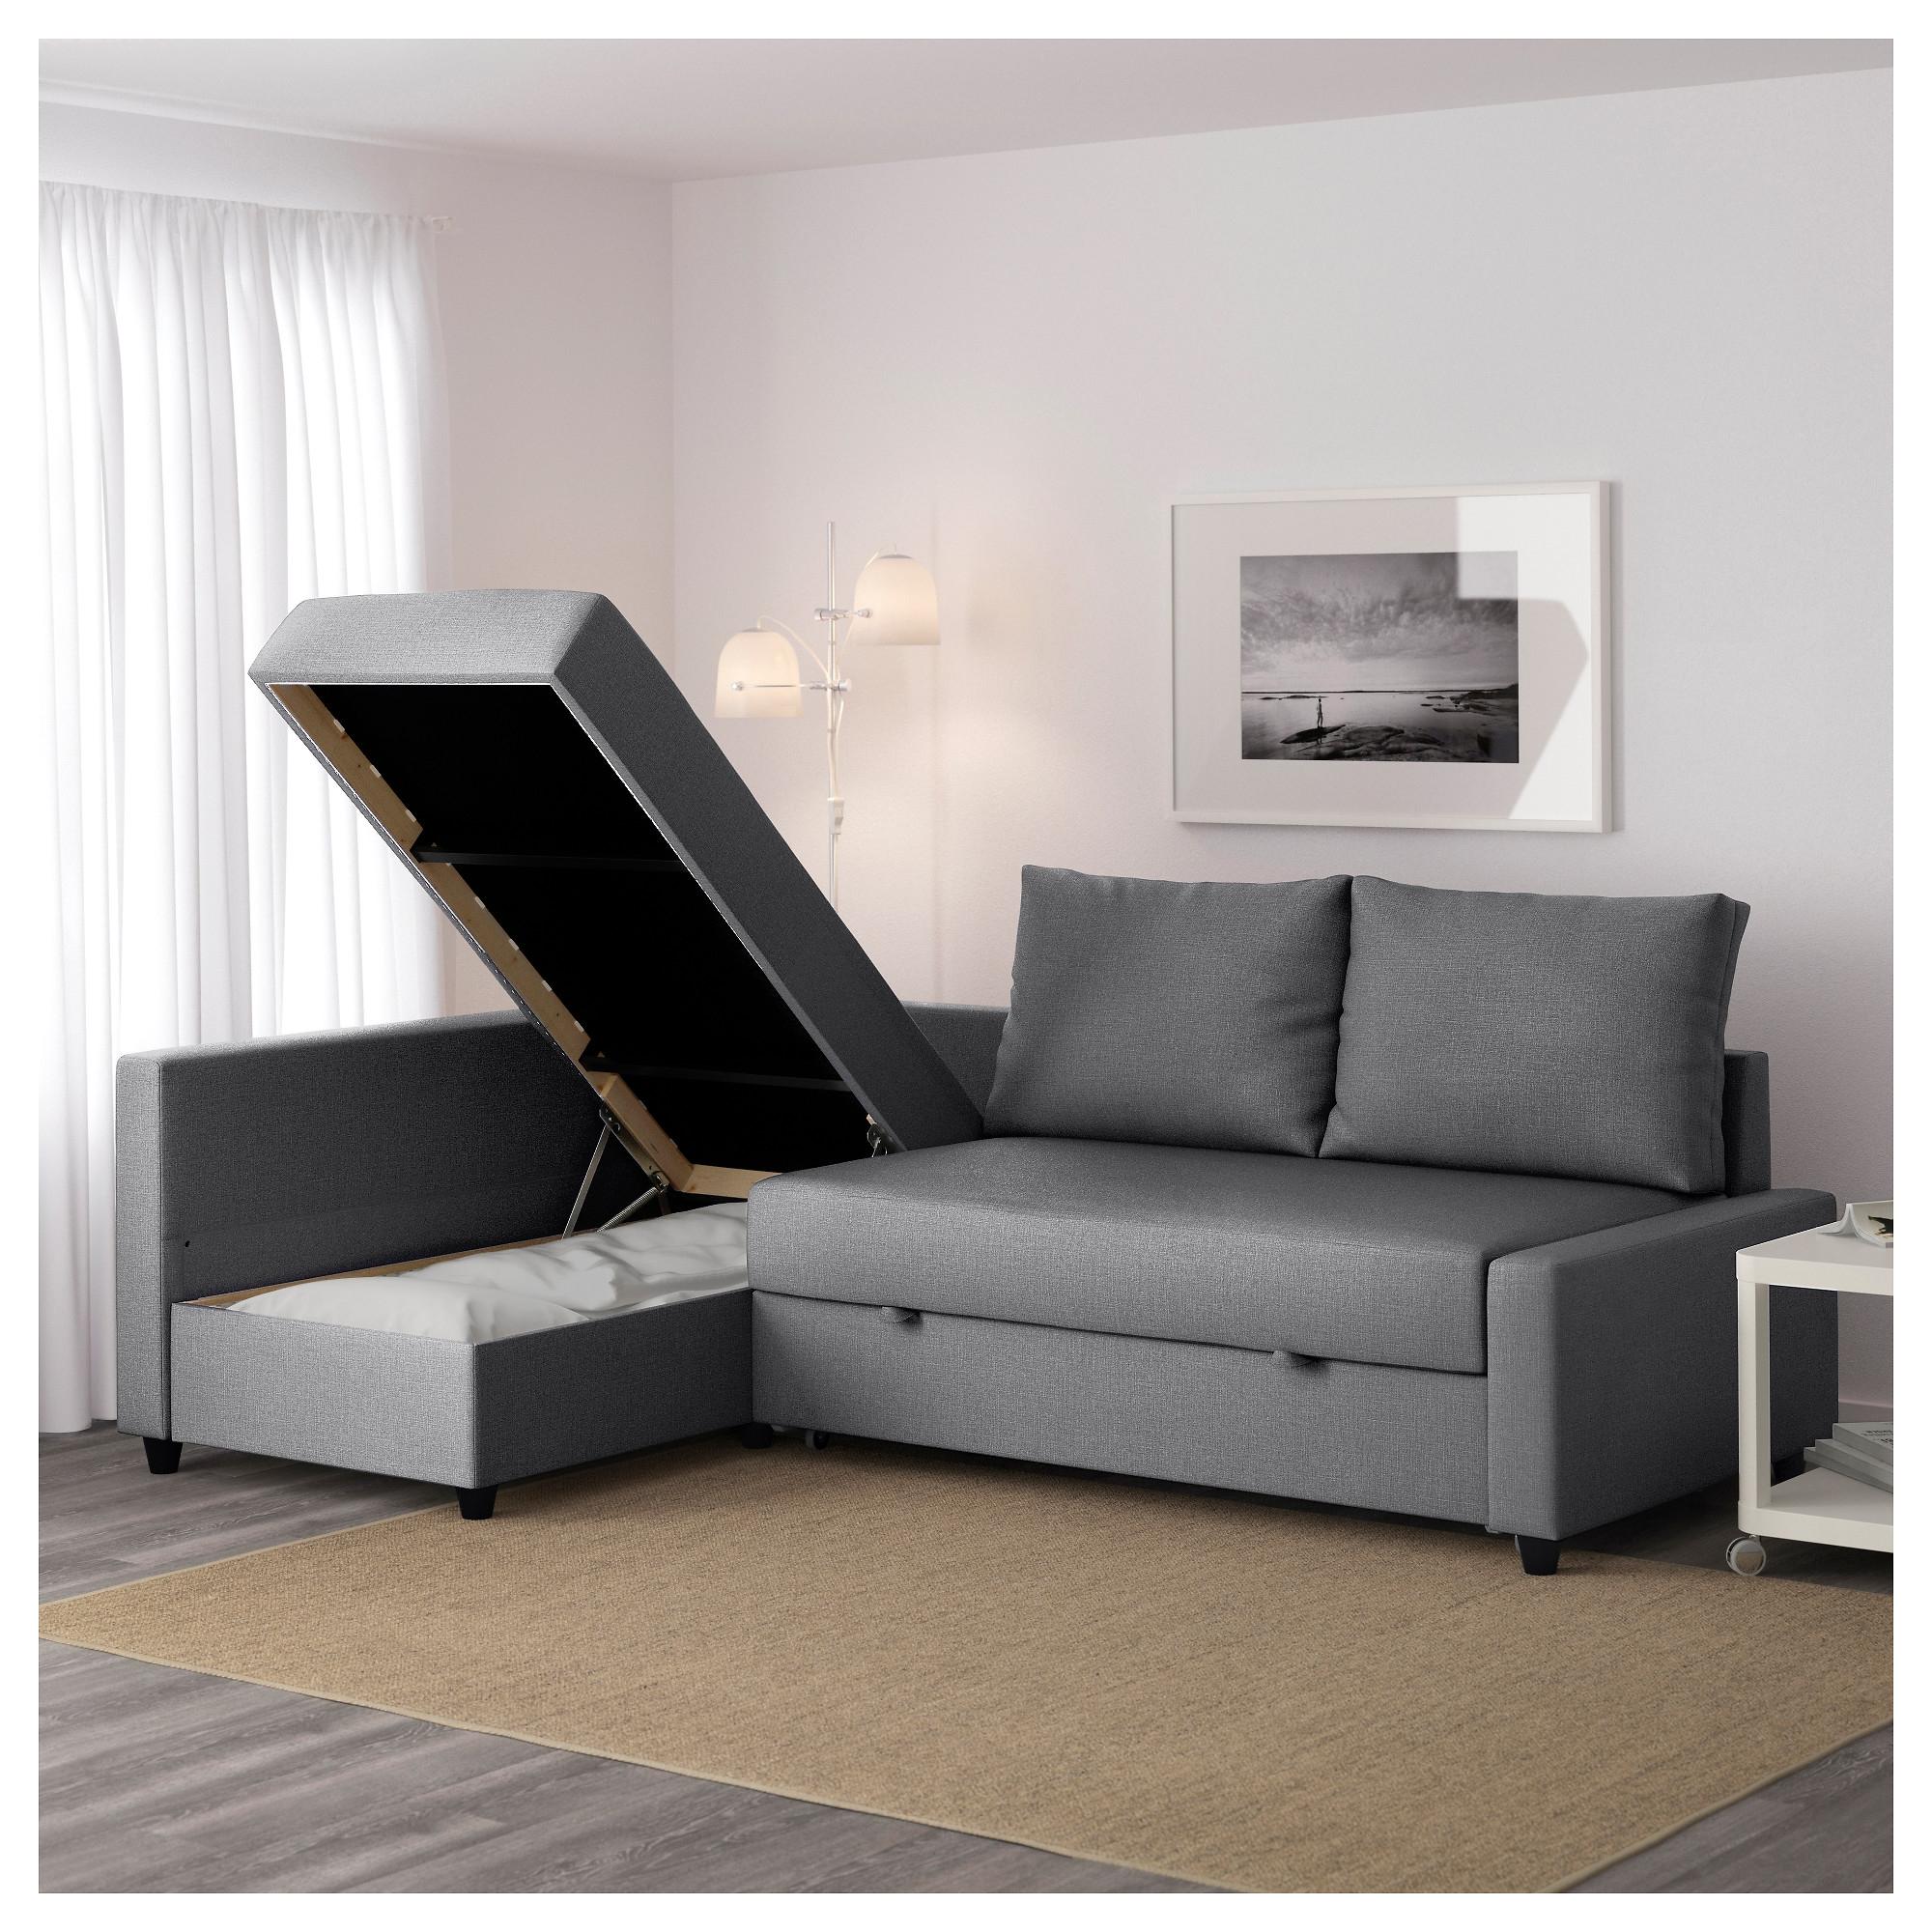 Friheten Corner Sofa Bed With Storage Skiftebo Dark Grey Ikea Inside Corner Couch Bed (Image 7 of 15)